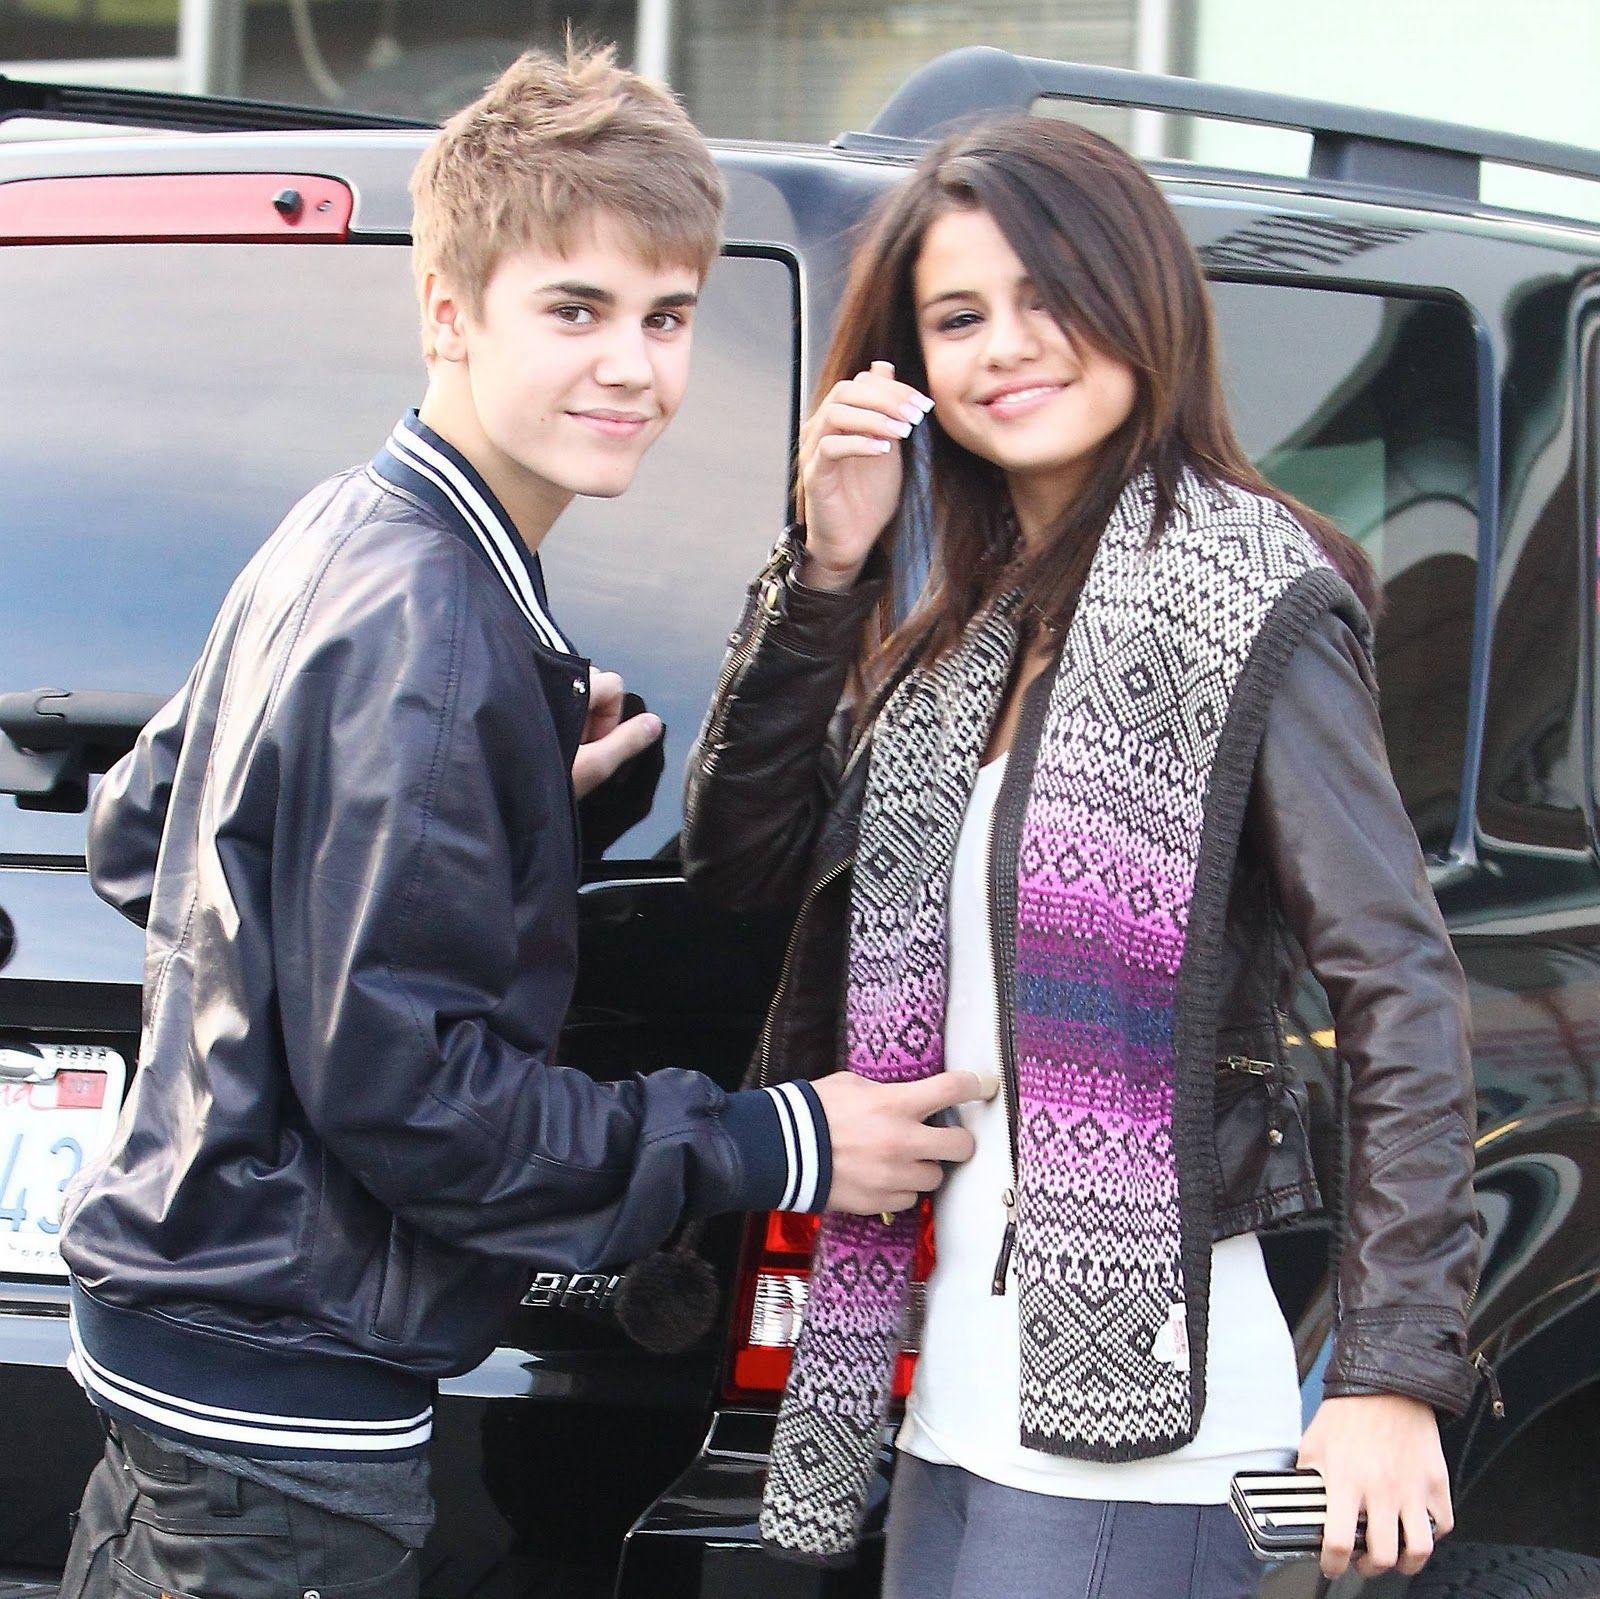 Justin Bieber And Selena Gomez Wallpaper Mobile Justin Bieber And Selena Justin Bieber Selena Gomez Bieber Selena